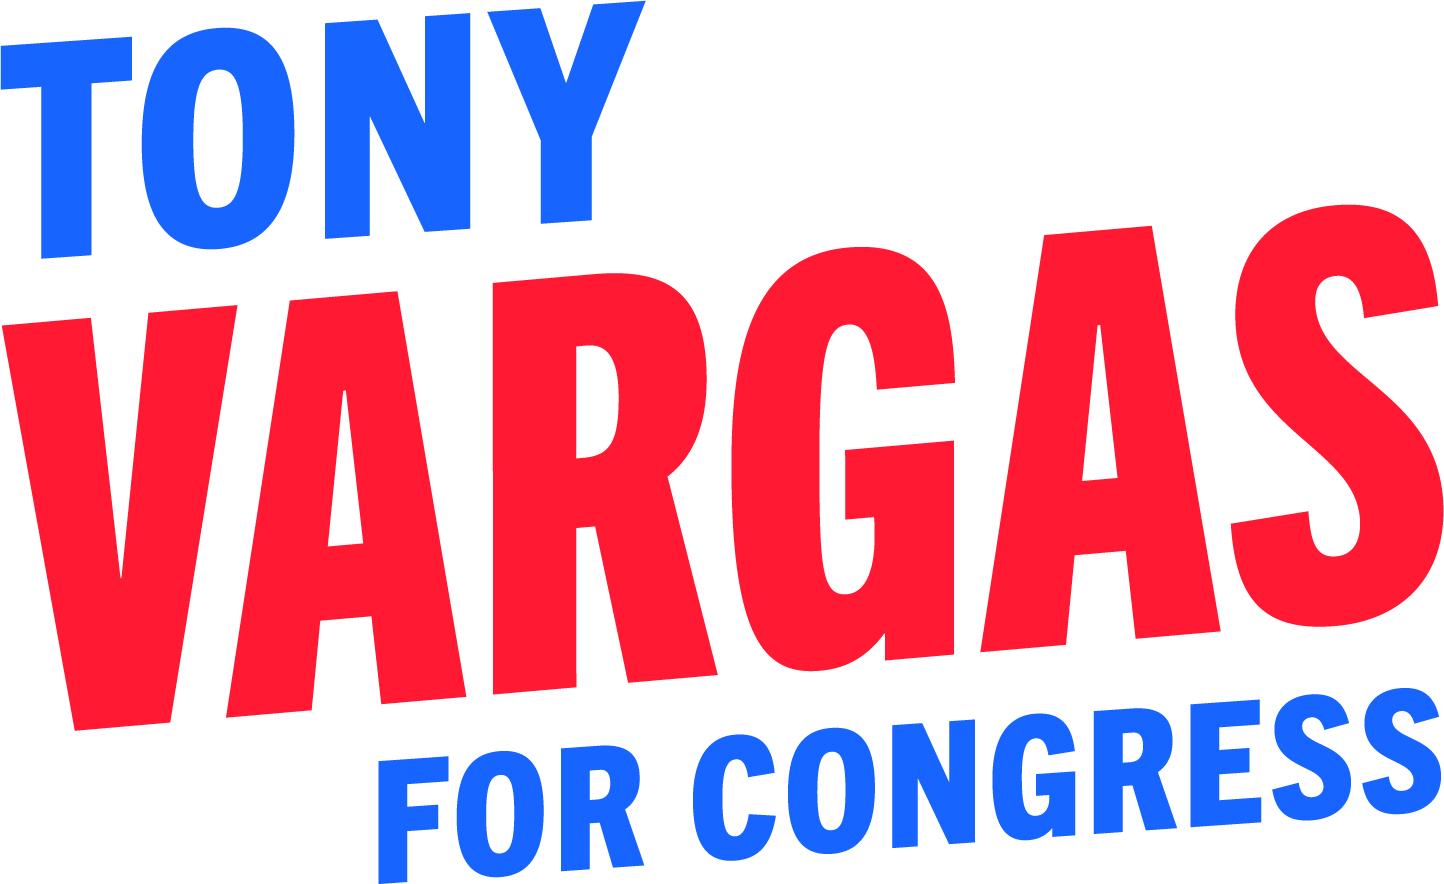 Tony Vargas for Congress